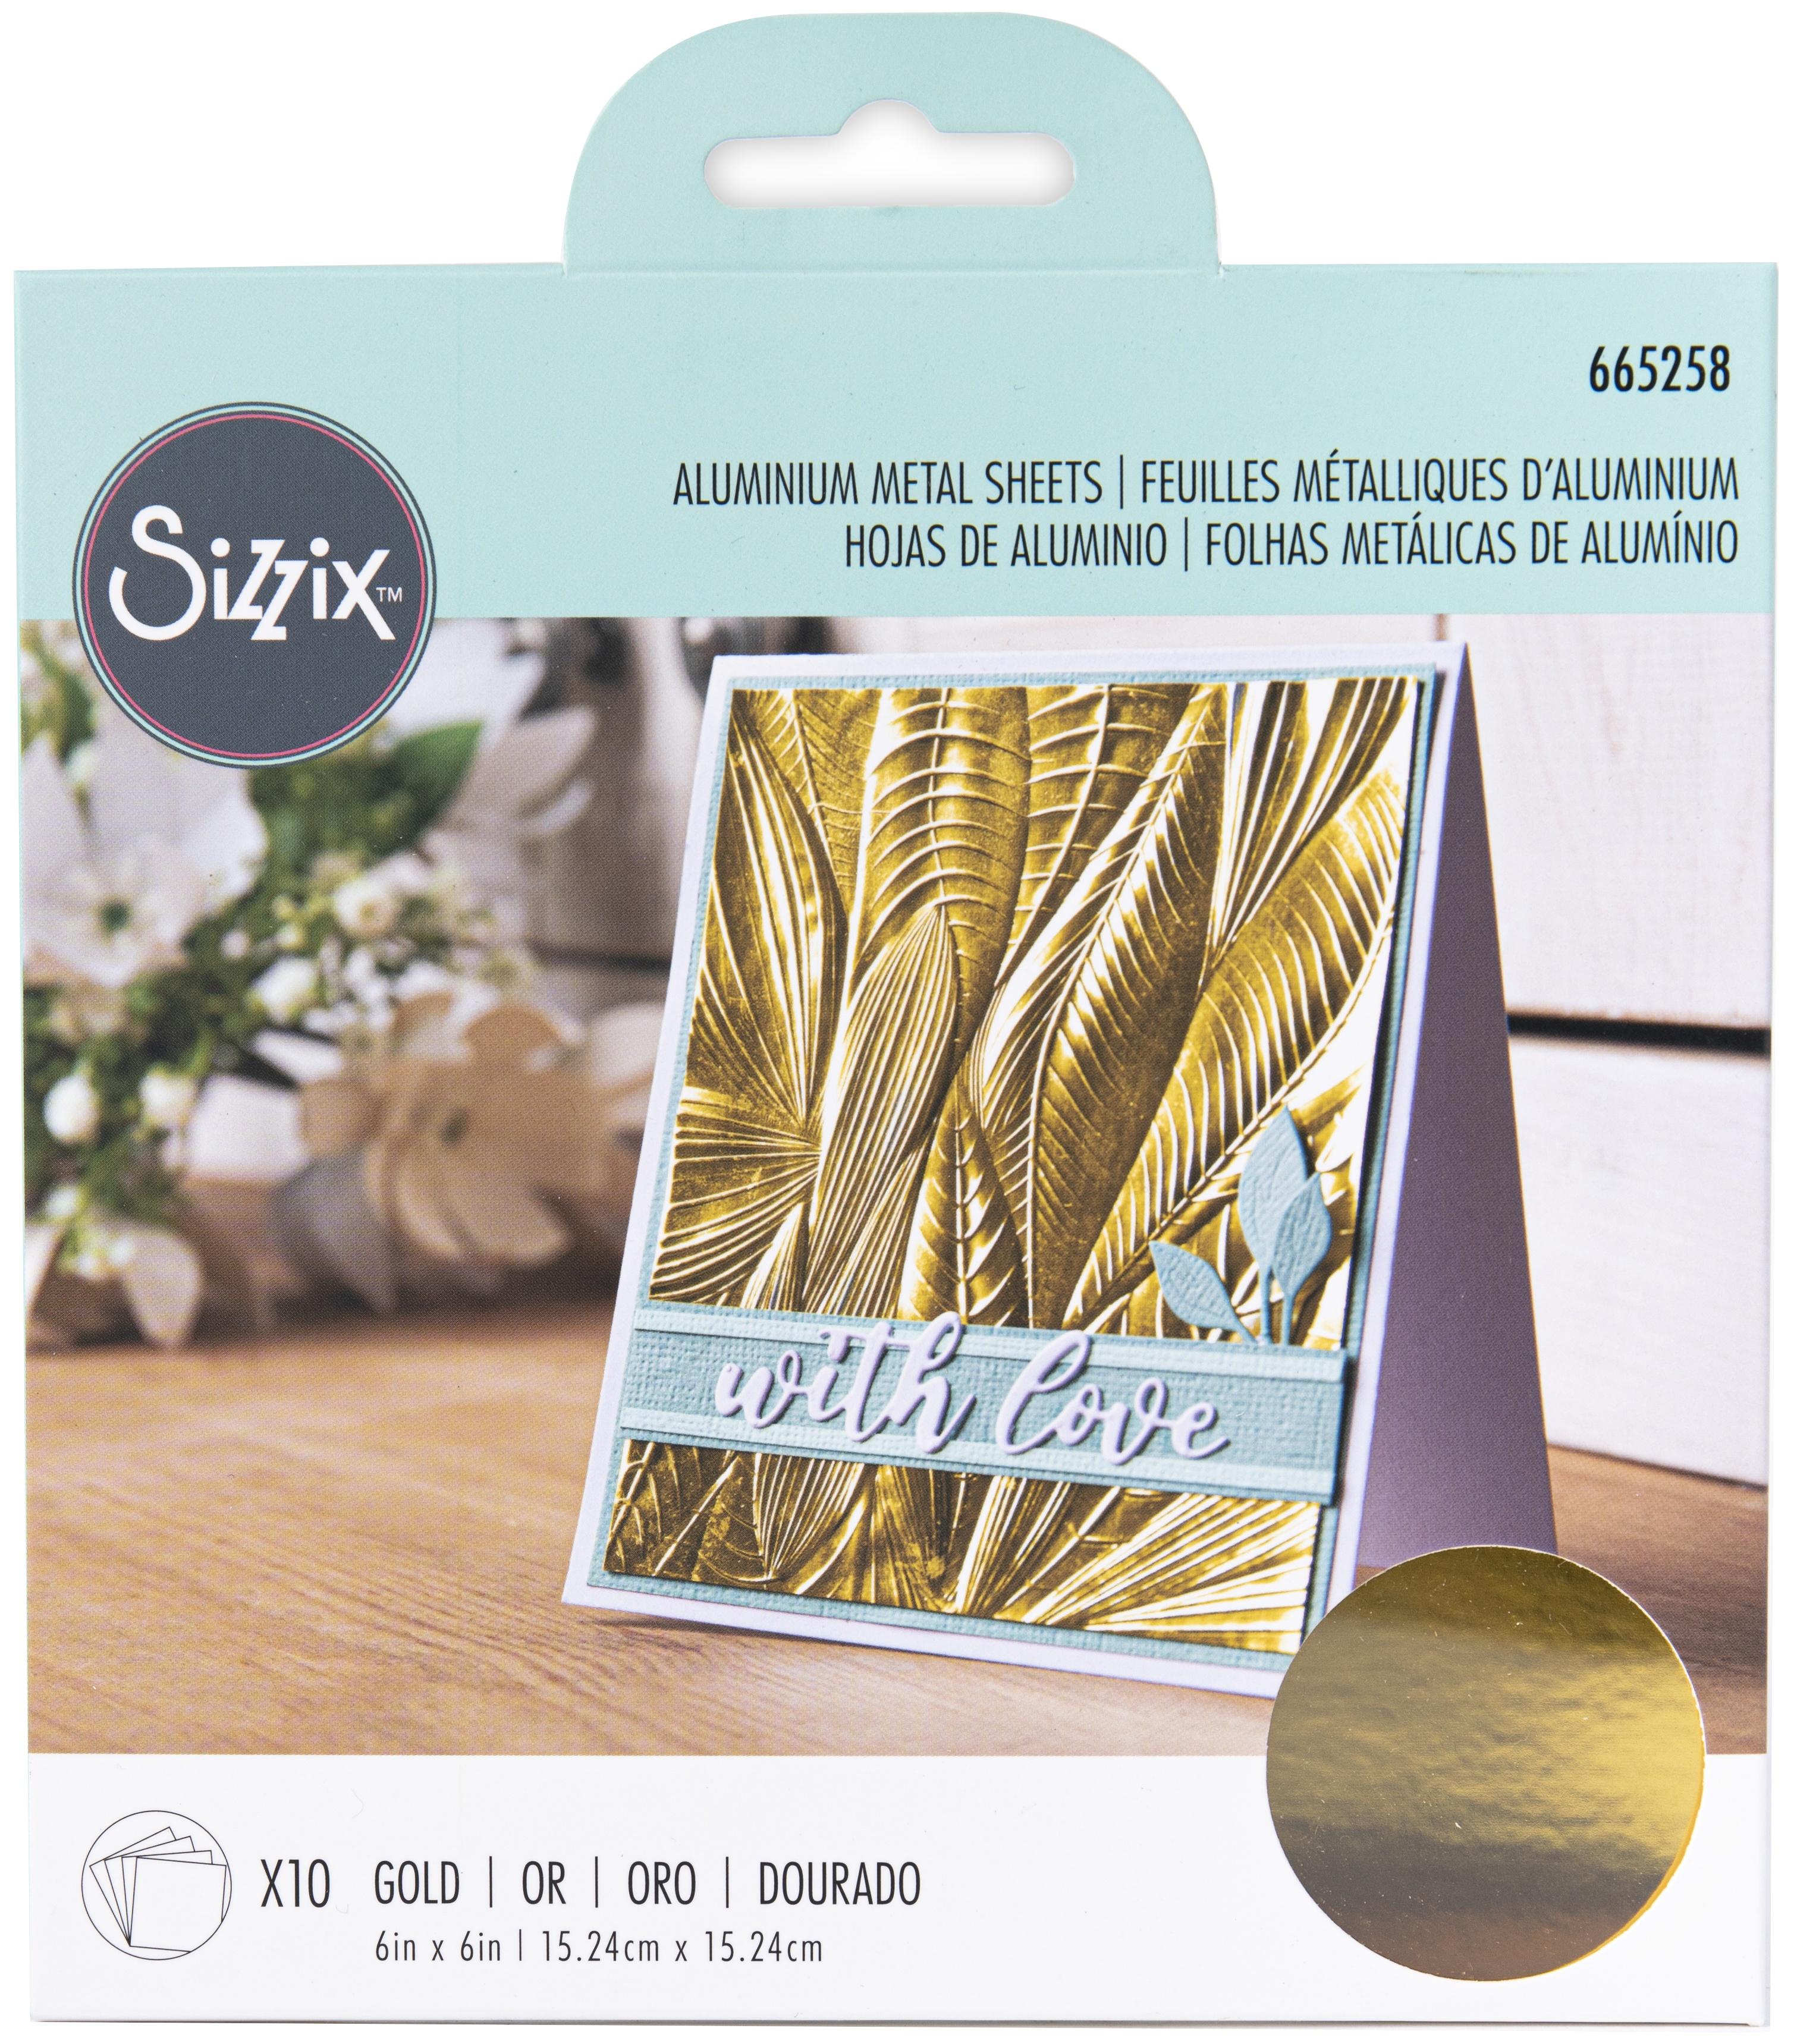 Sizzix Surfacez Aluminum Metal Sheets  Gold